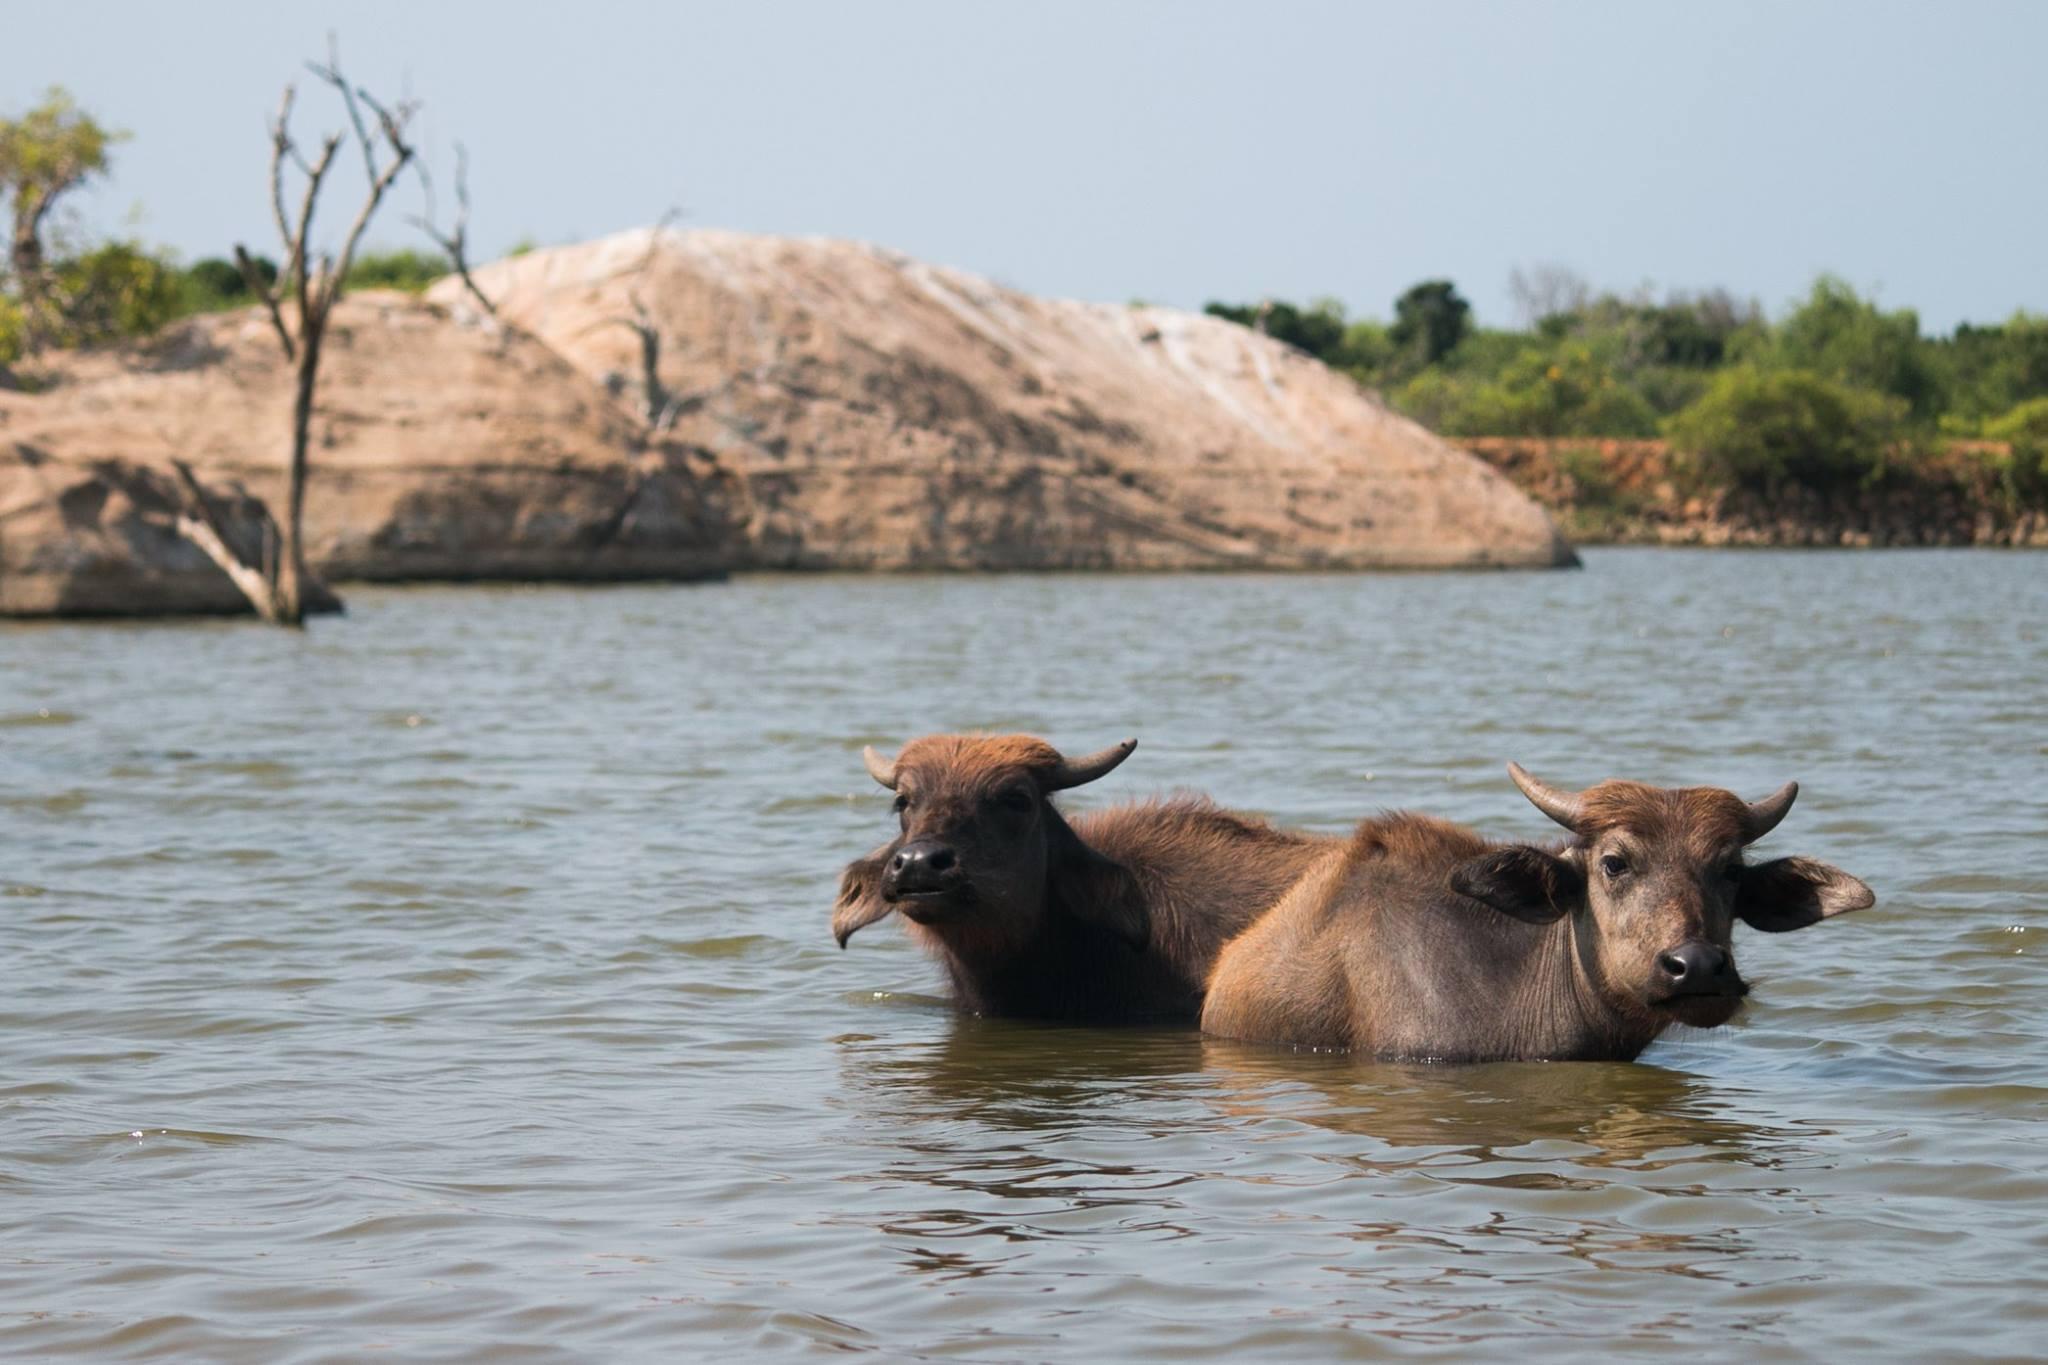 invite-to-paradise-sri-lanka-and-maldives-specialists-travel-agent-tour-operator-customer-review-feedback-joel-rhian-water-buffalo-2.jpg